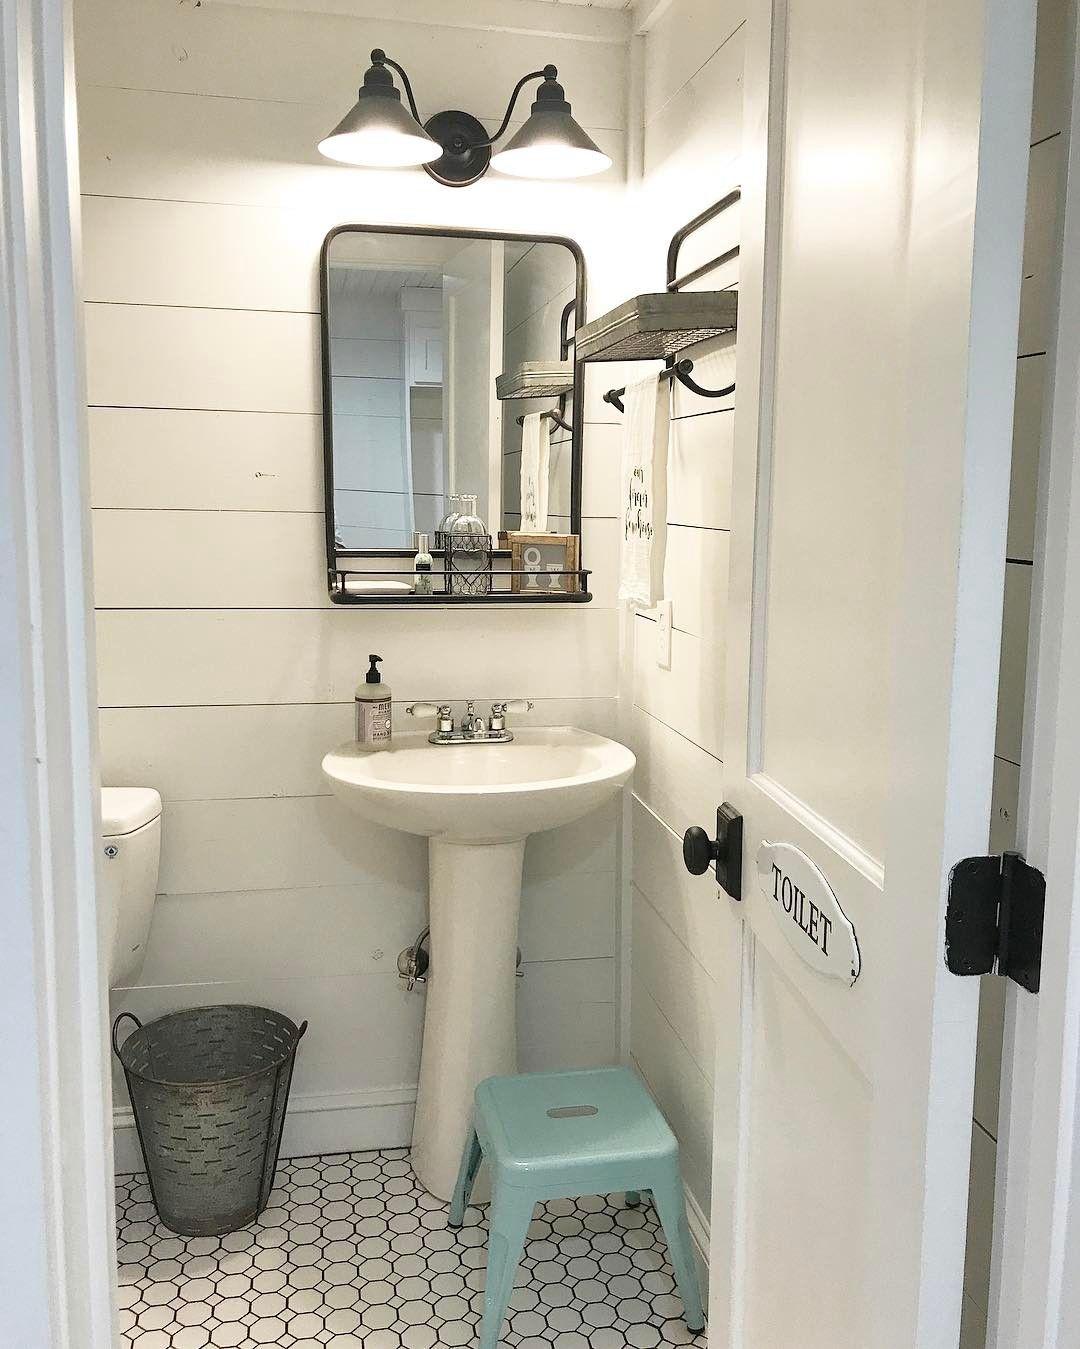 pinashley palmer on top three  half bathroom decor